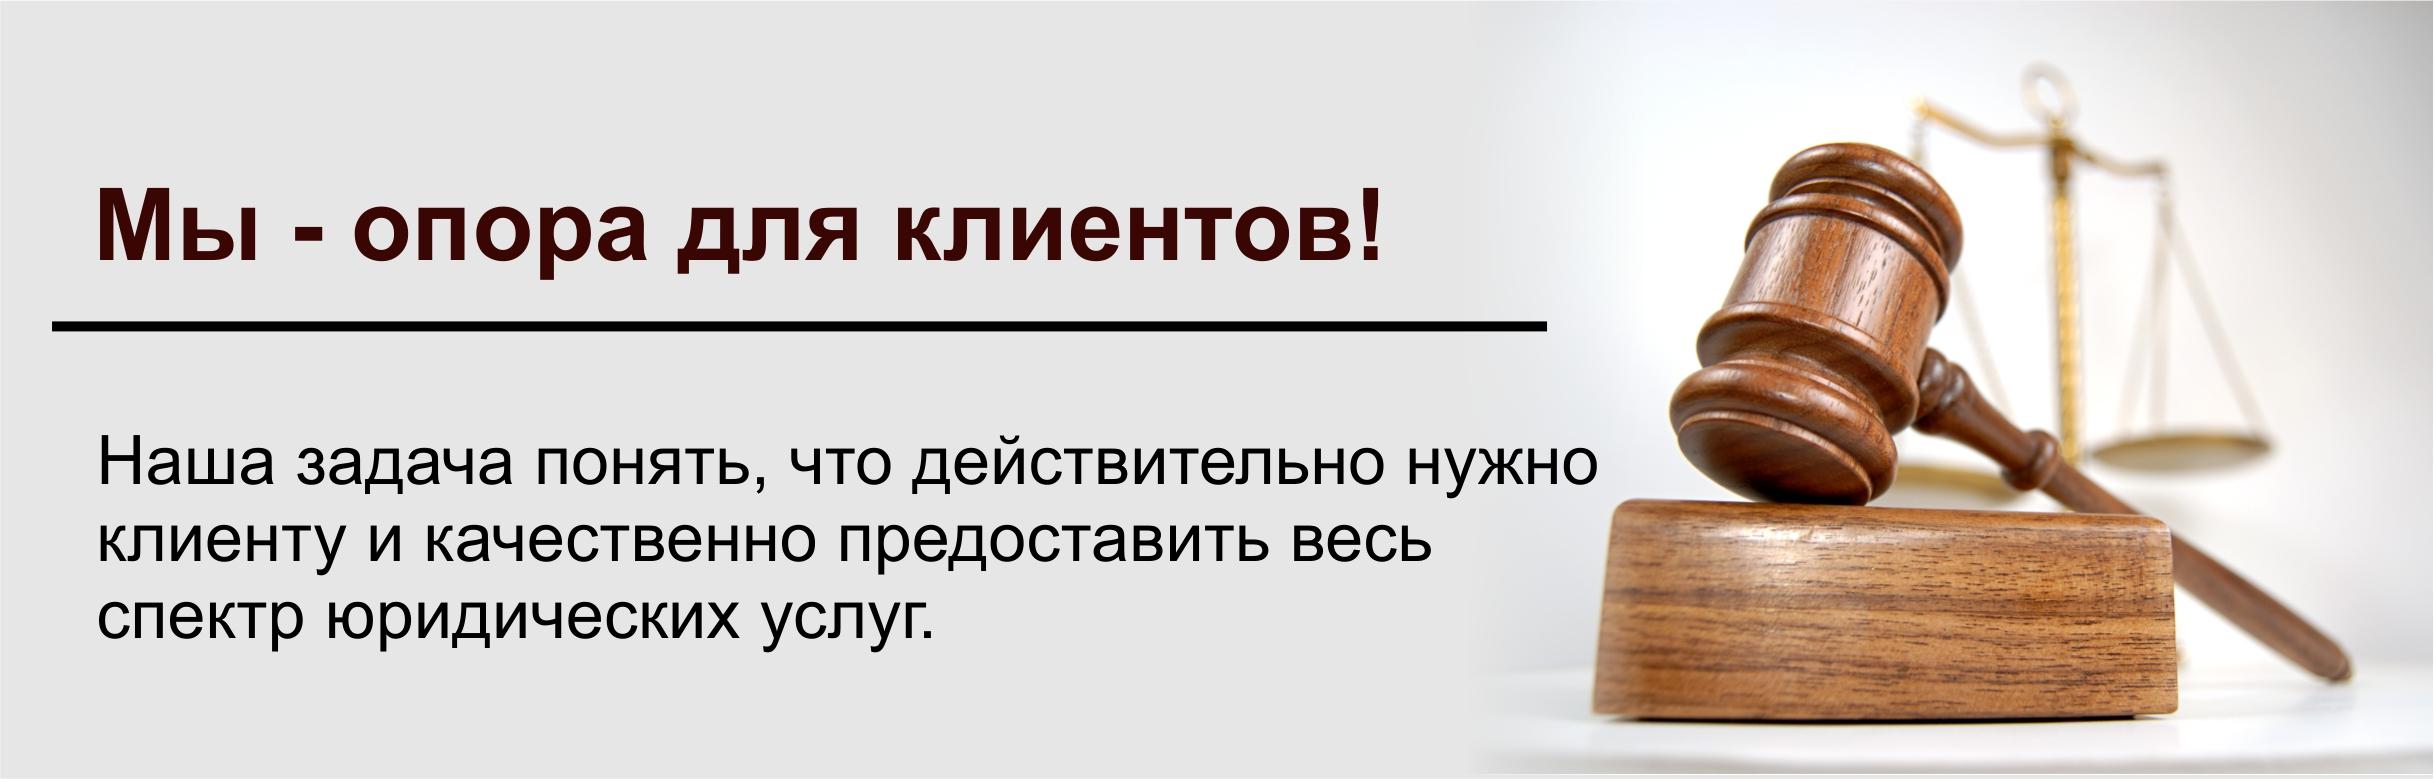 дождями юрист белгород консультация наследство одном месте